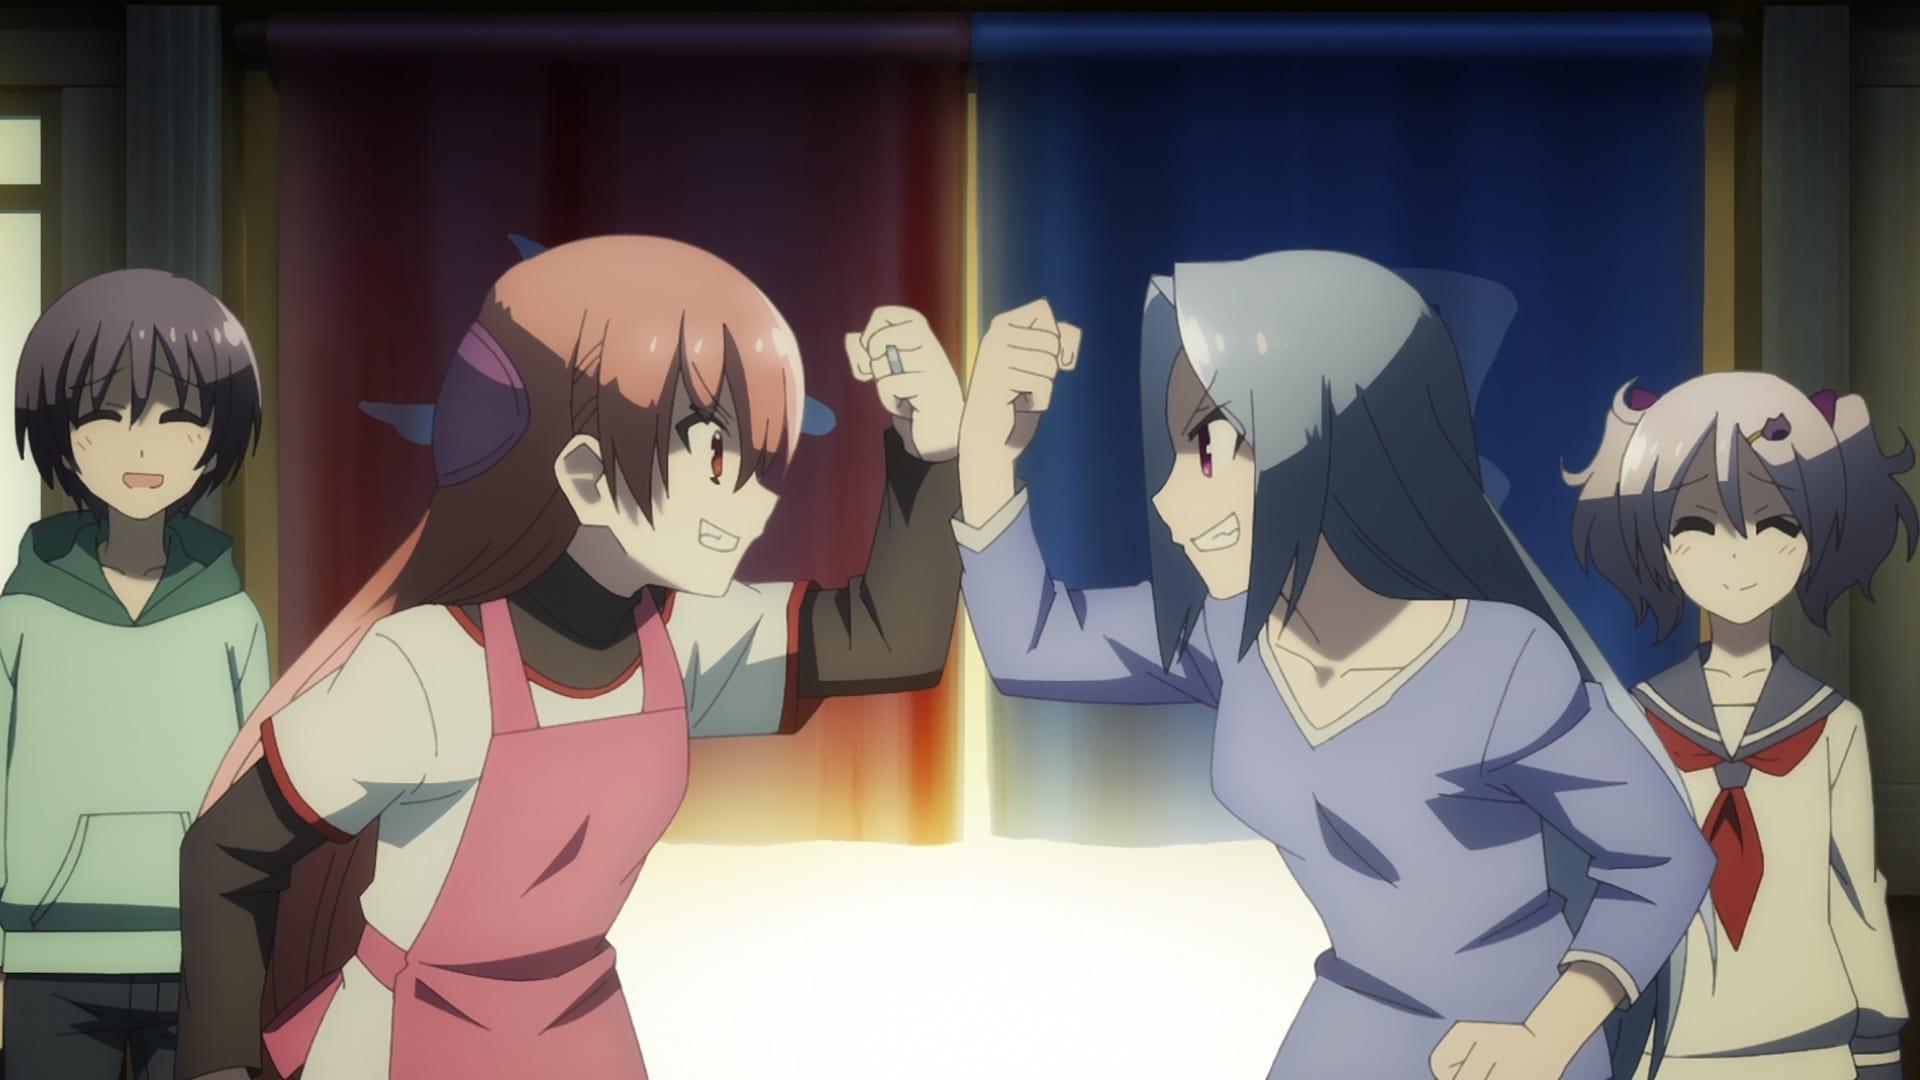 Tonikaku Kawaii Episode 11